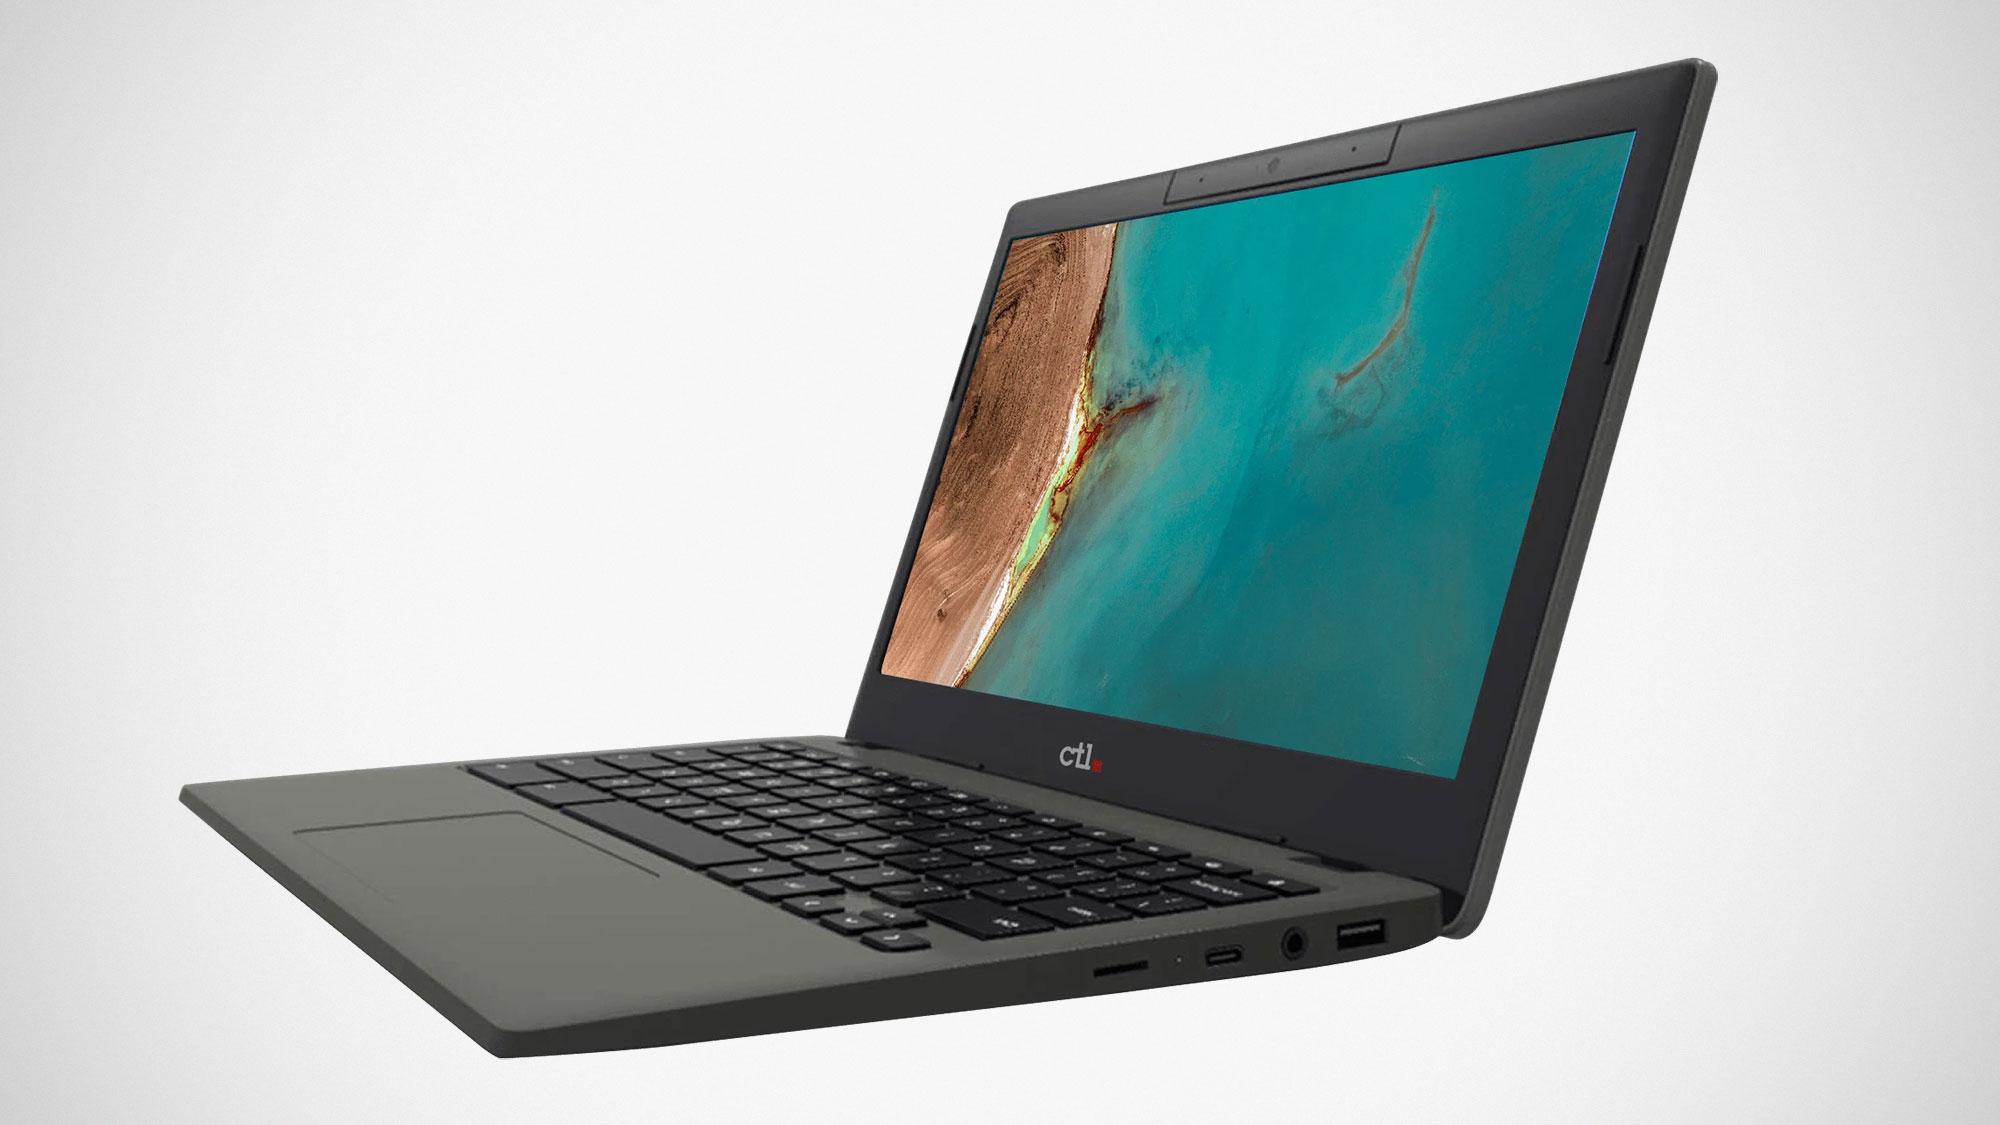 CTL Chromebook NL72 Series Laptops